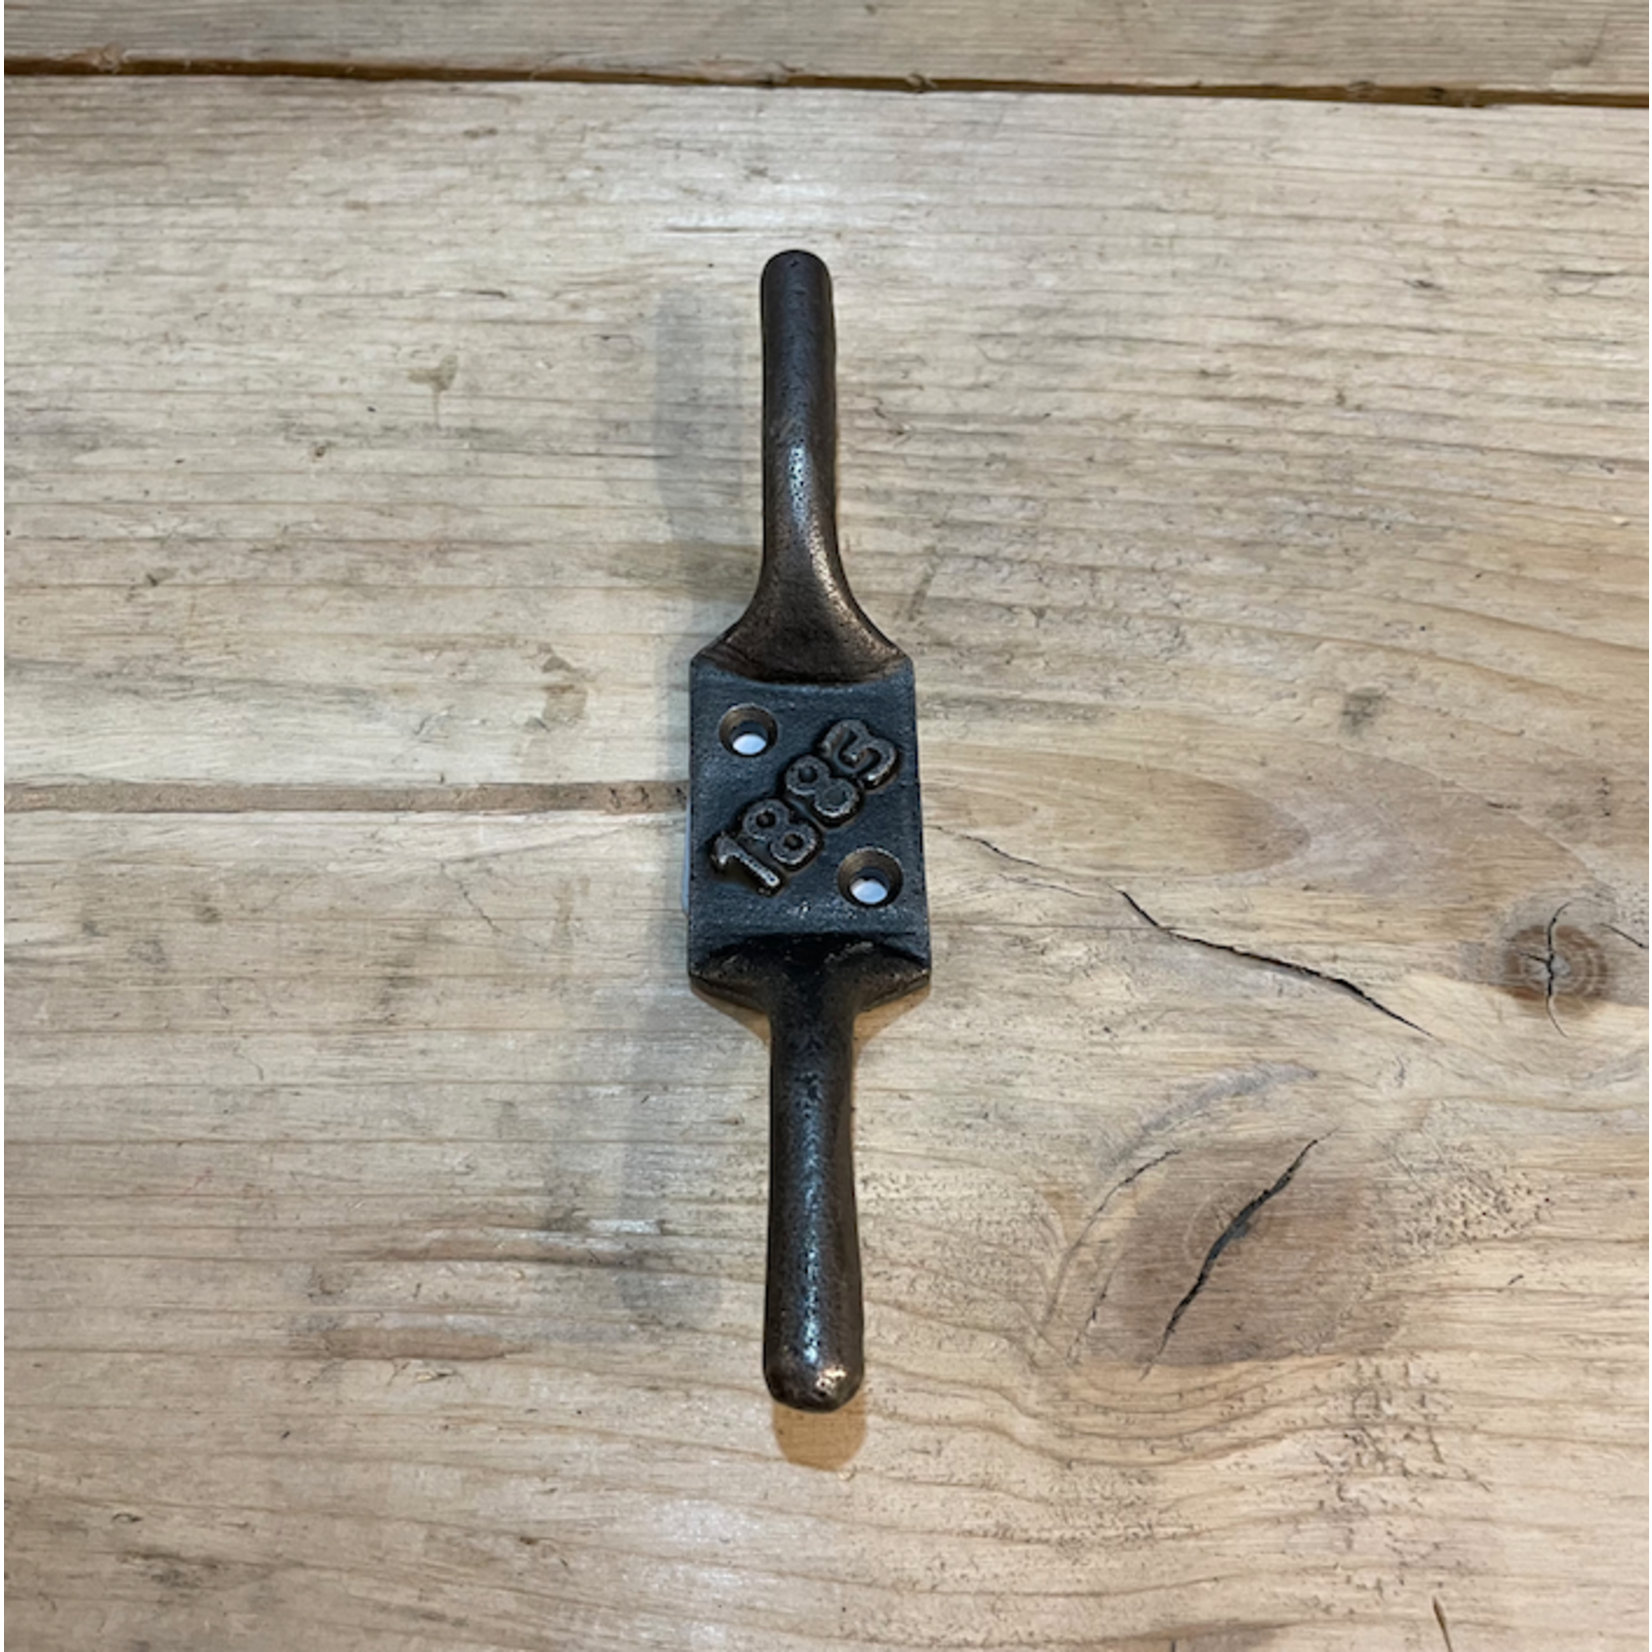 IRON RANGE Double Cleat Hook '1883' Antique Iron